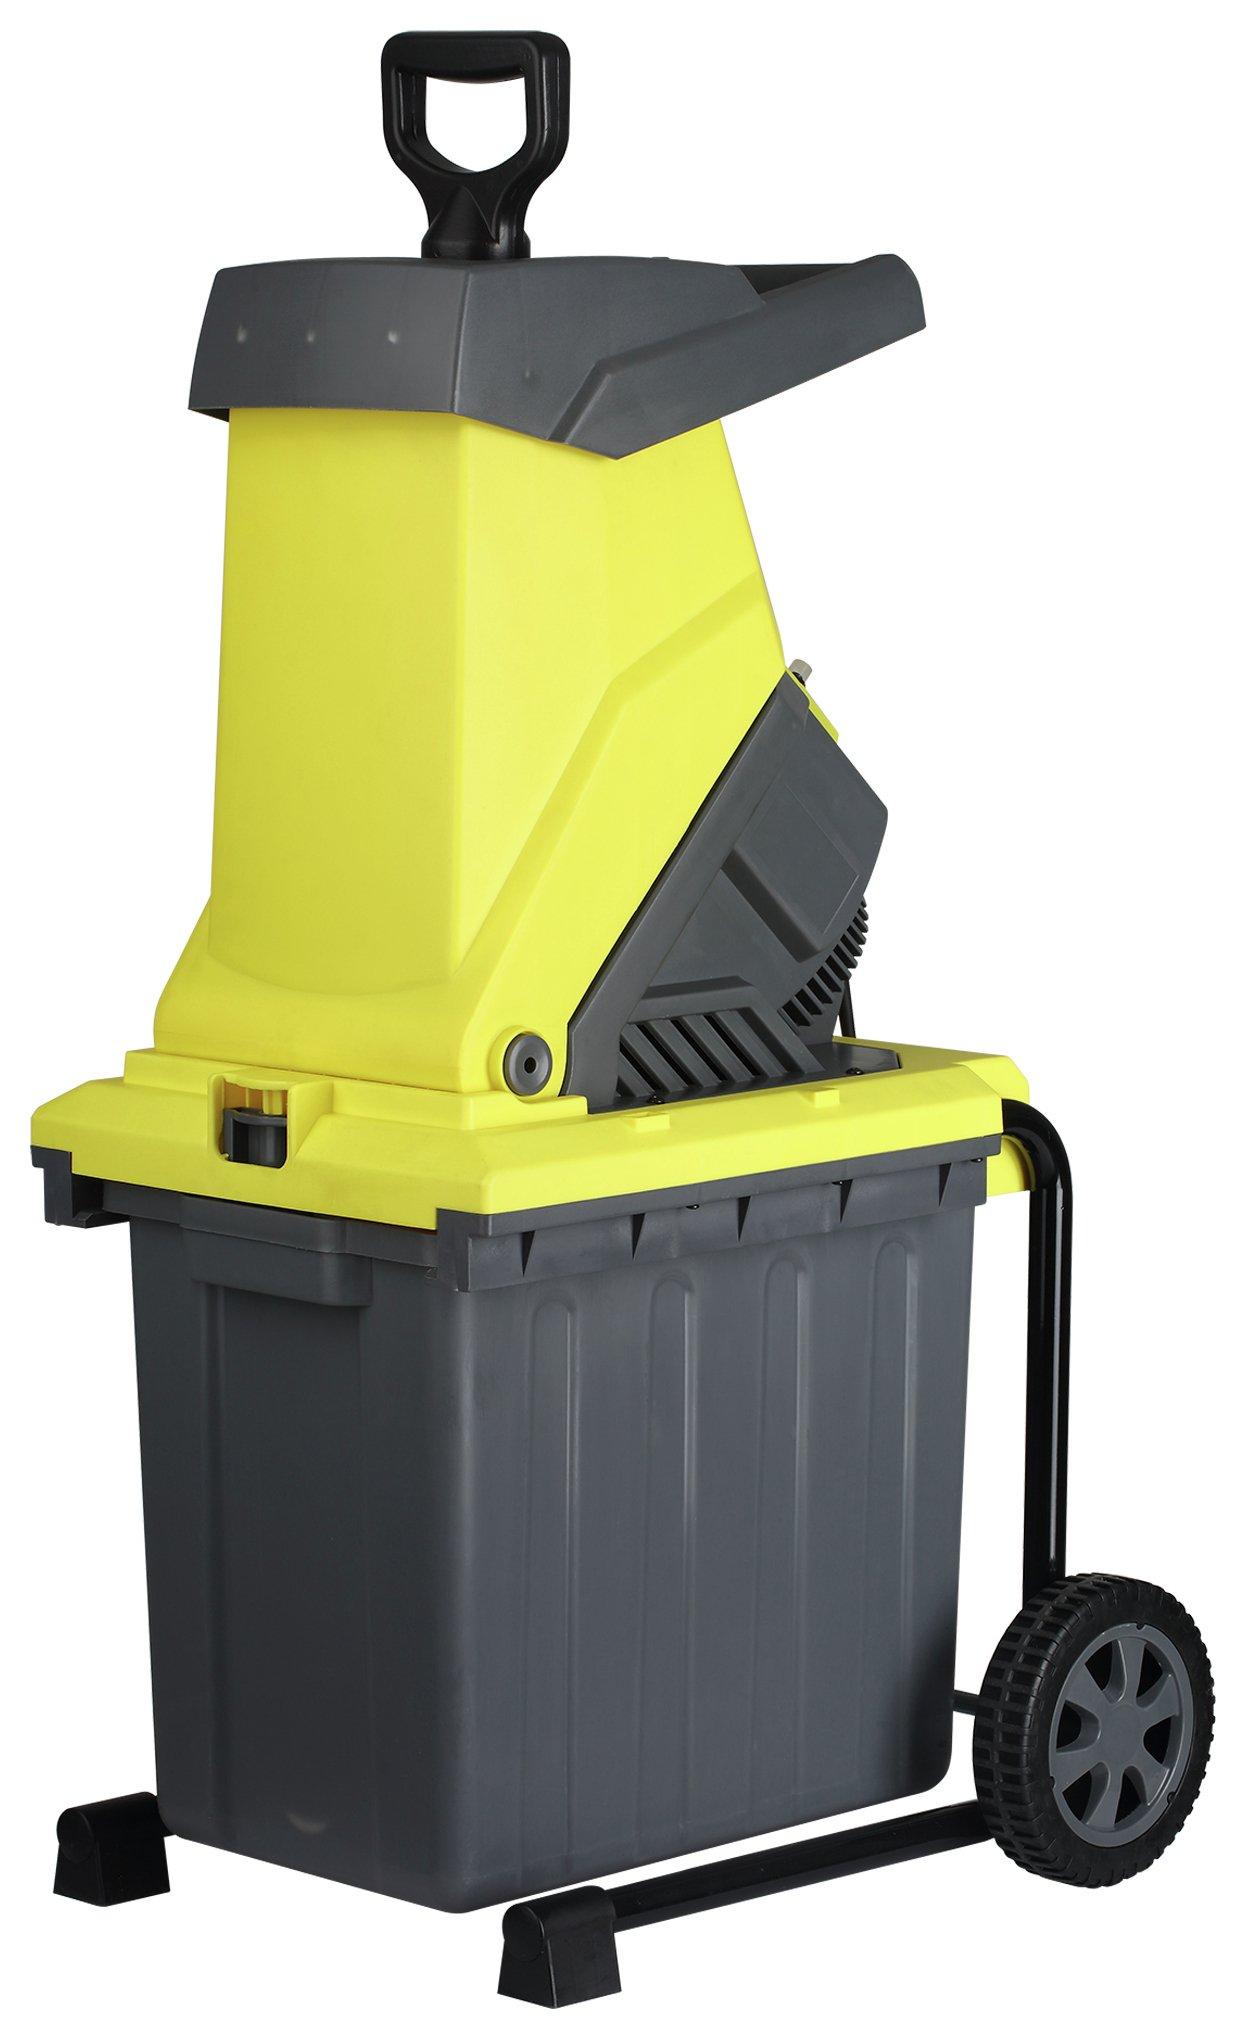 Impact Garden Shredder 2500w